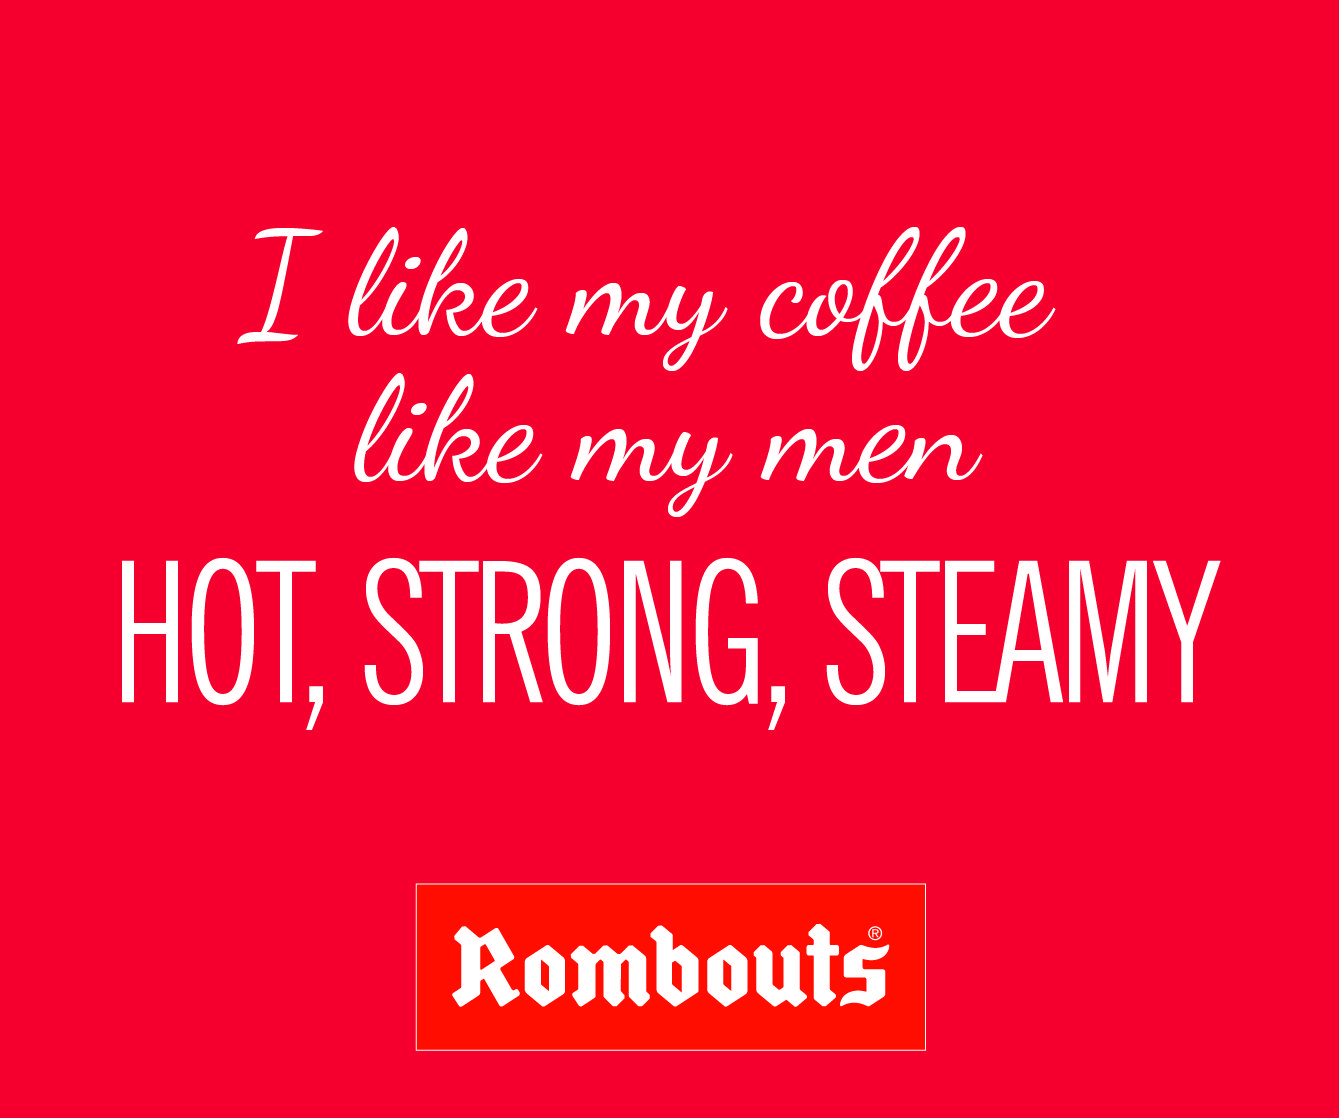 I like my coffee like my men hot strong steamy my